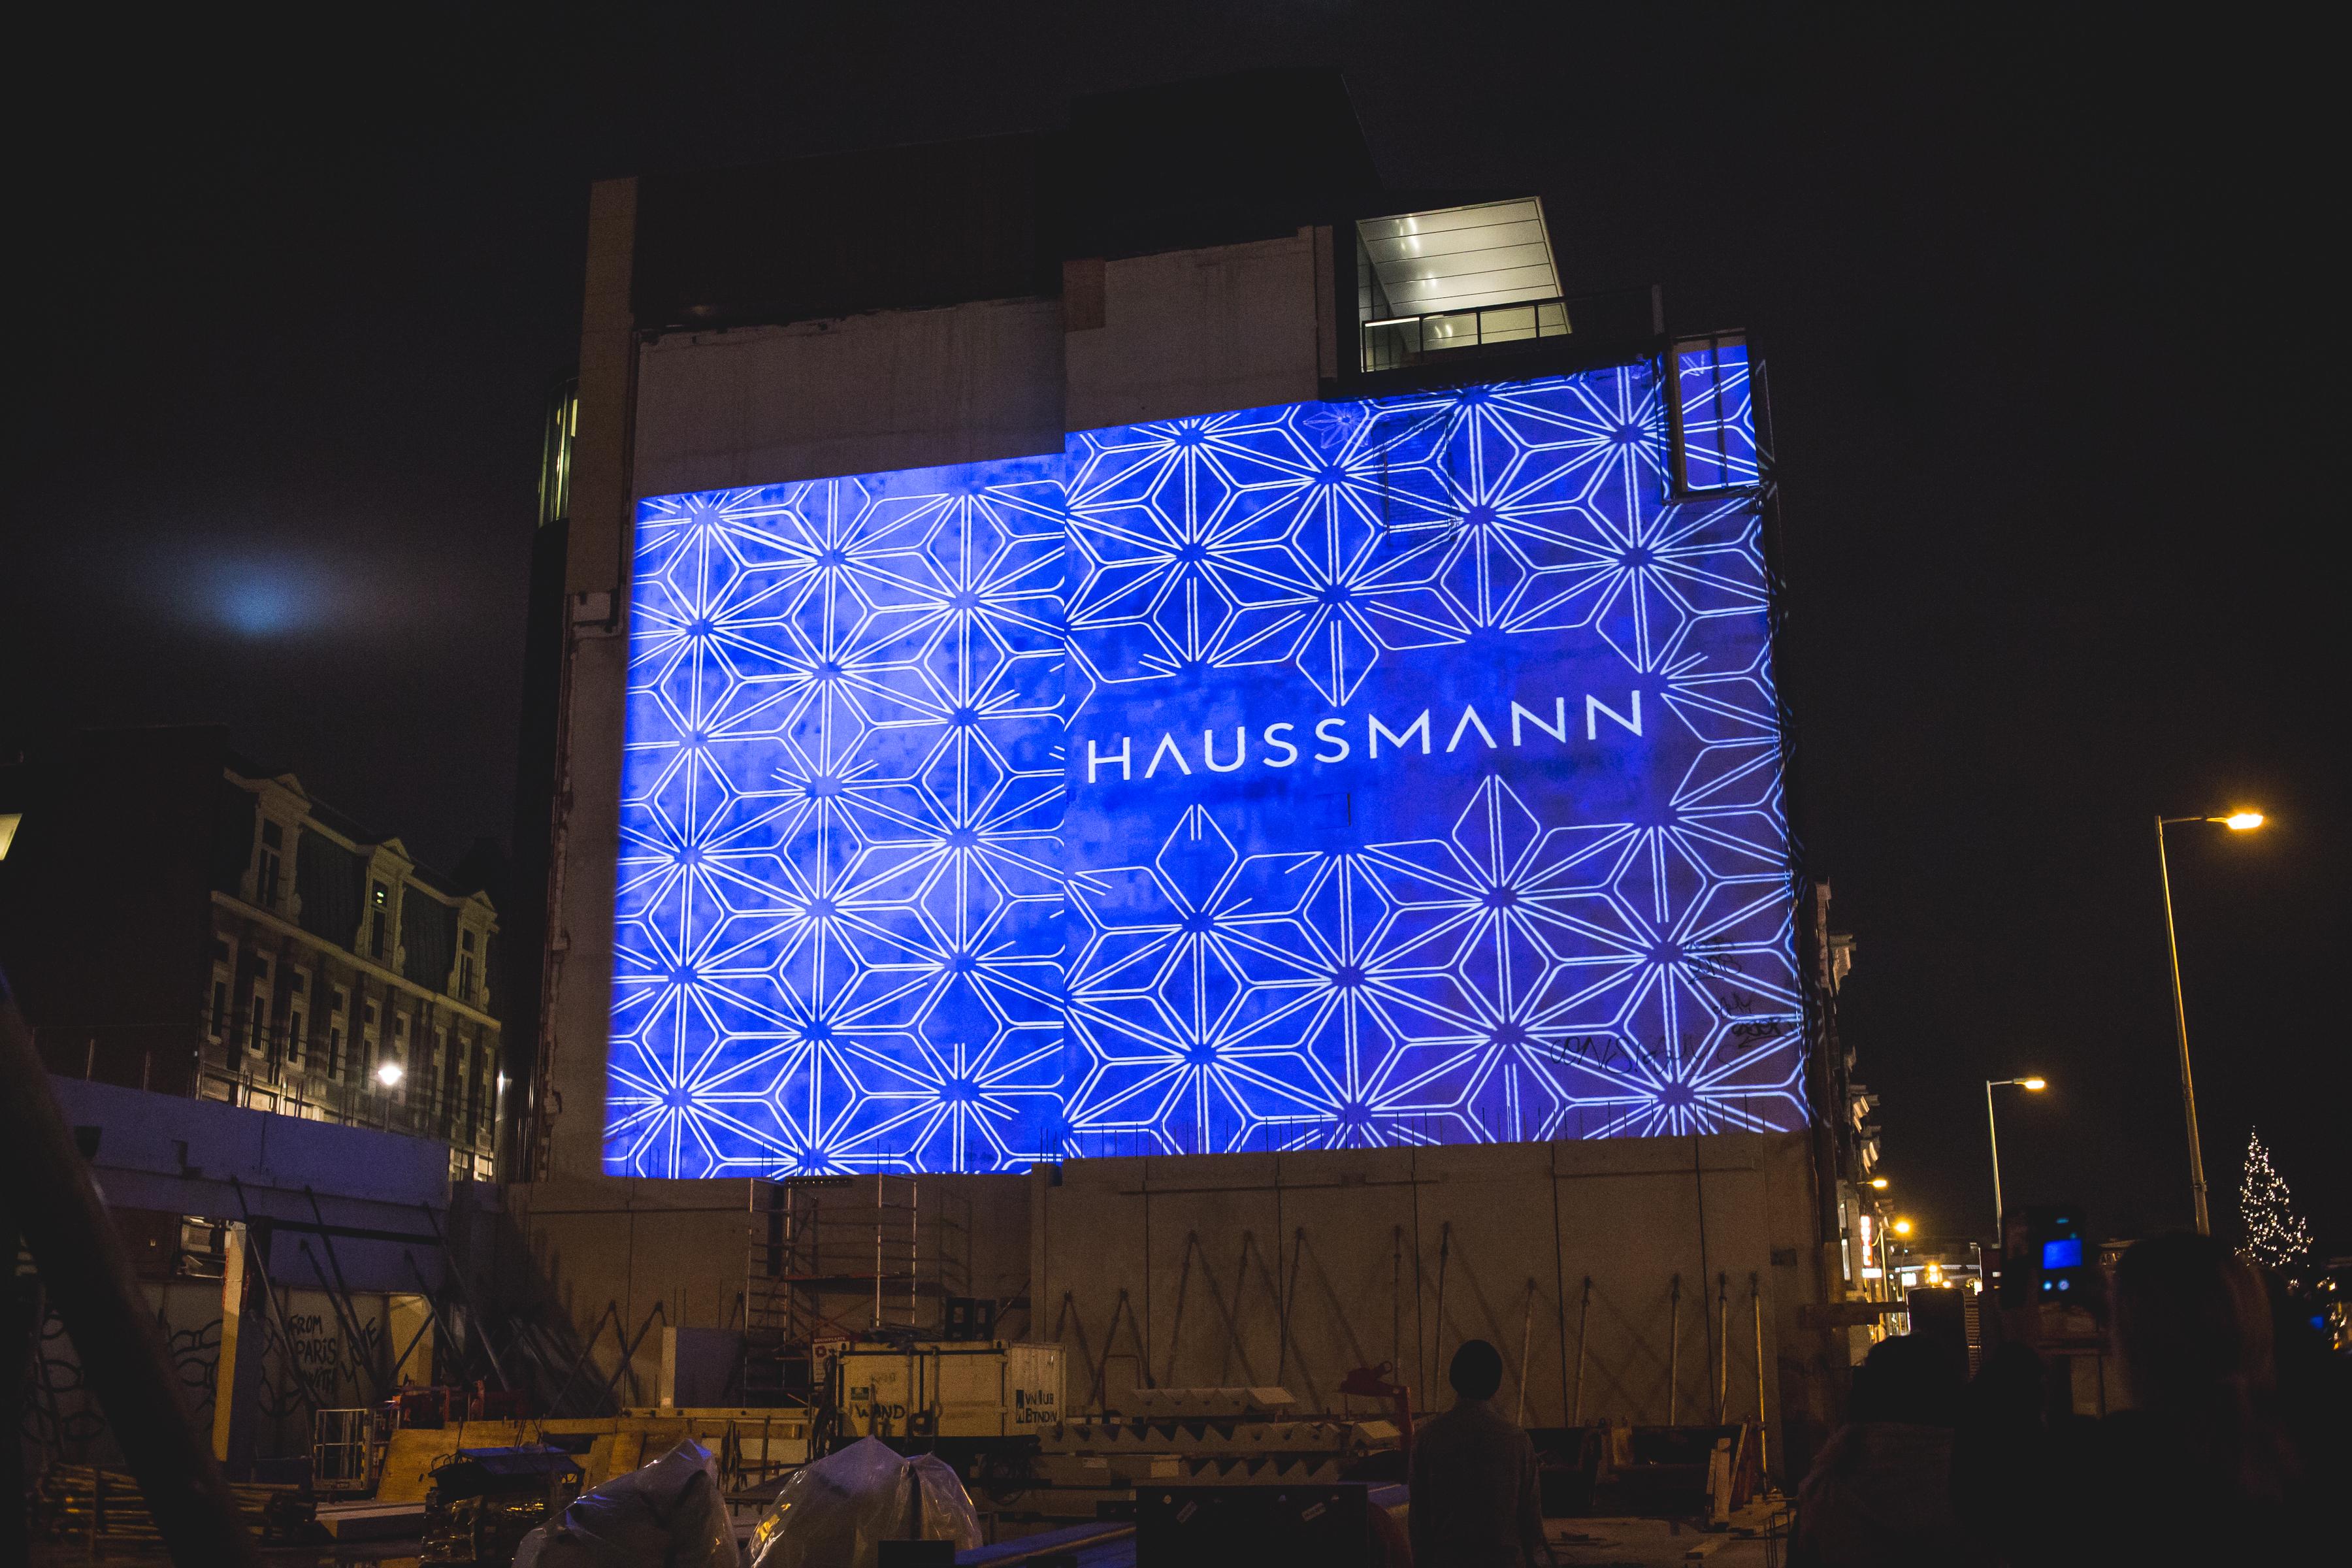 Hausmann-hr-37